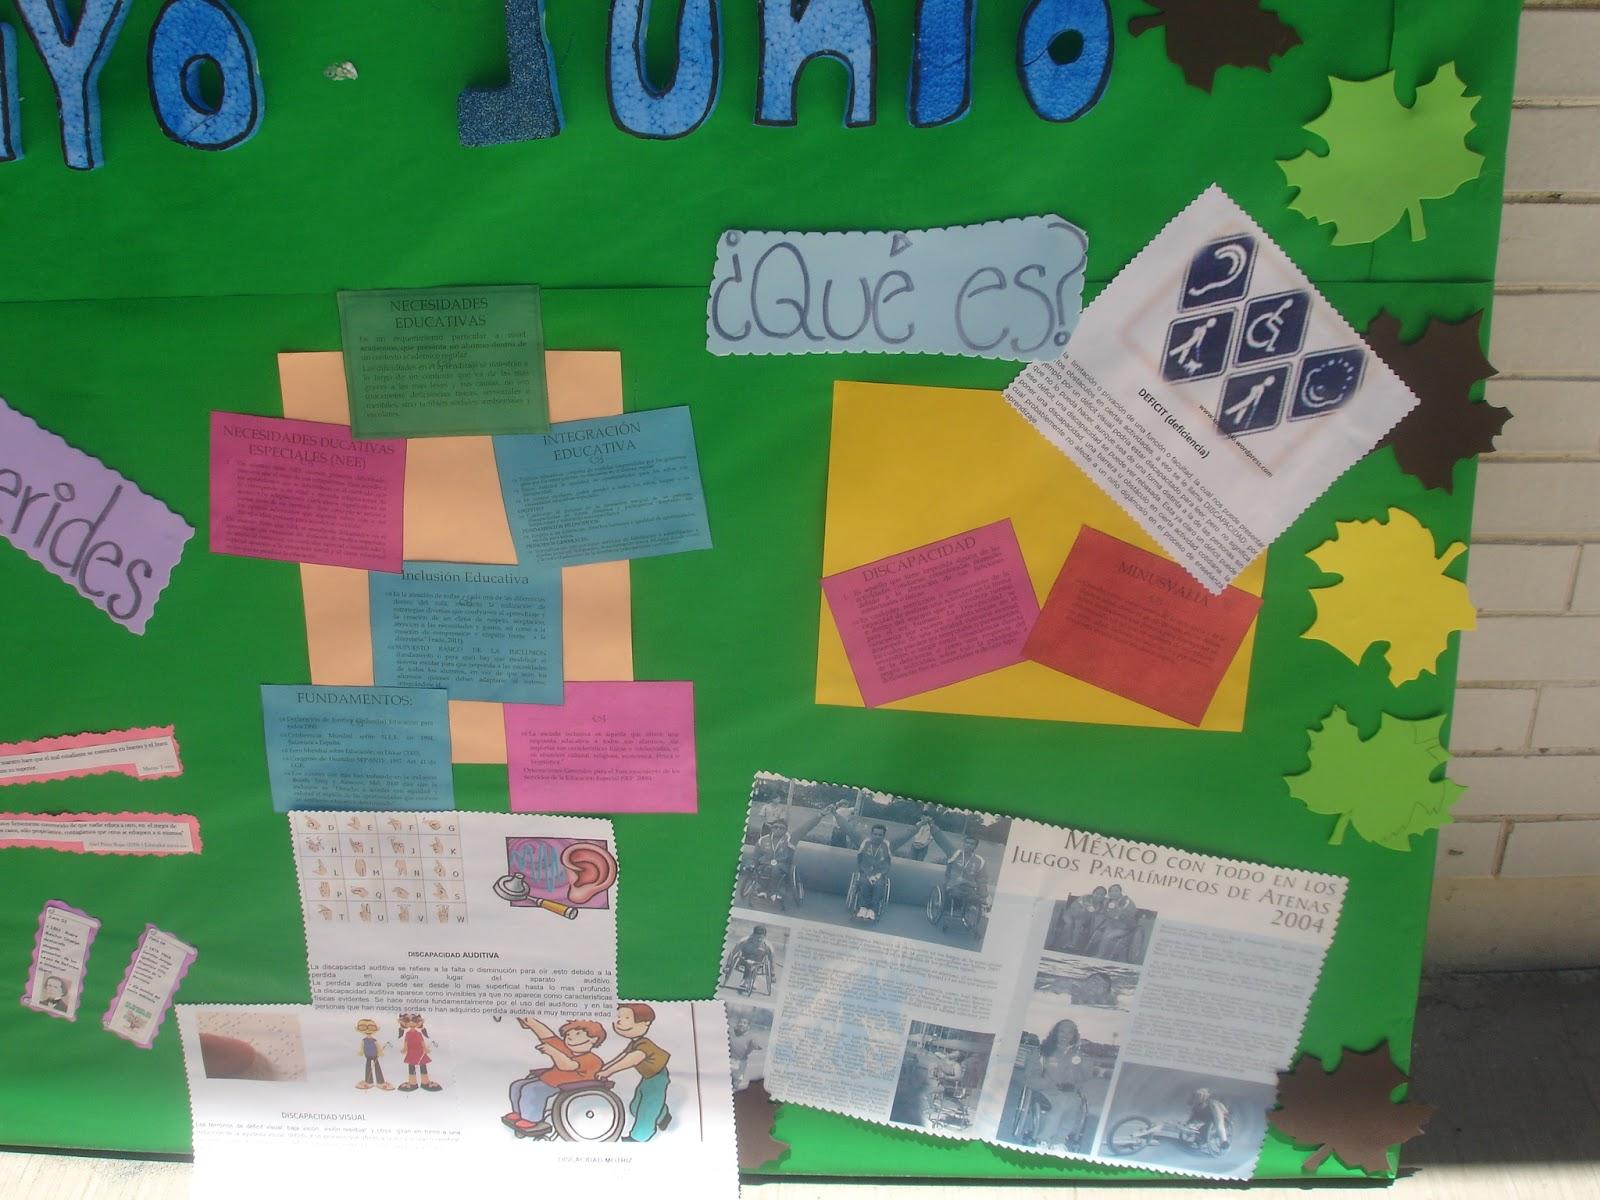 Observaci n del proceso escolar mayo 2012 for Concepto de periodico mural